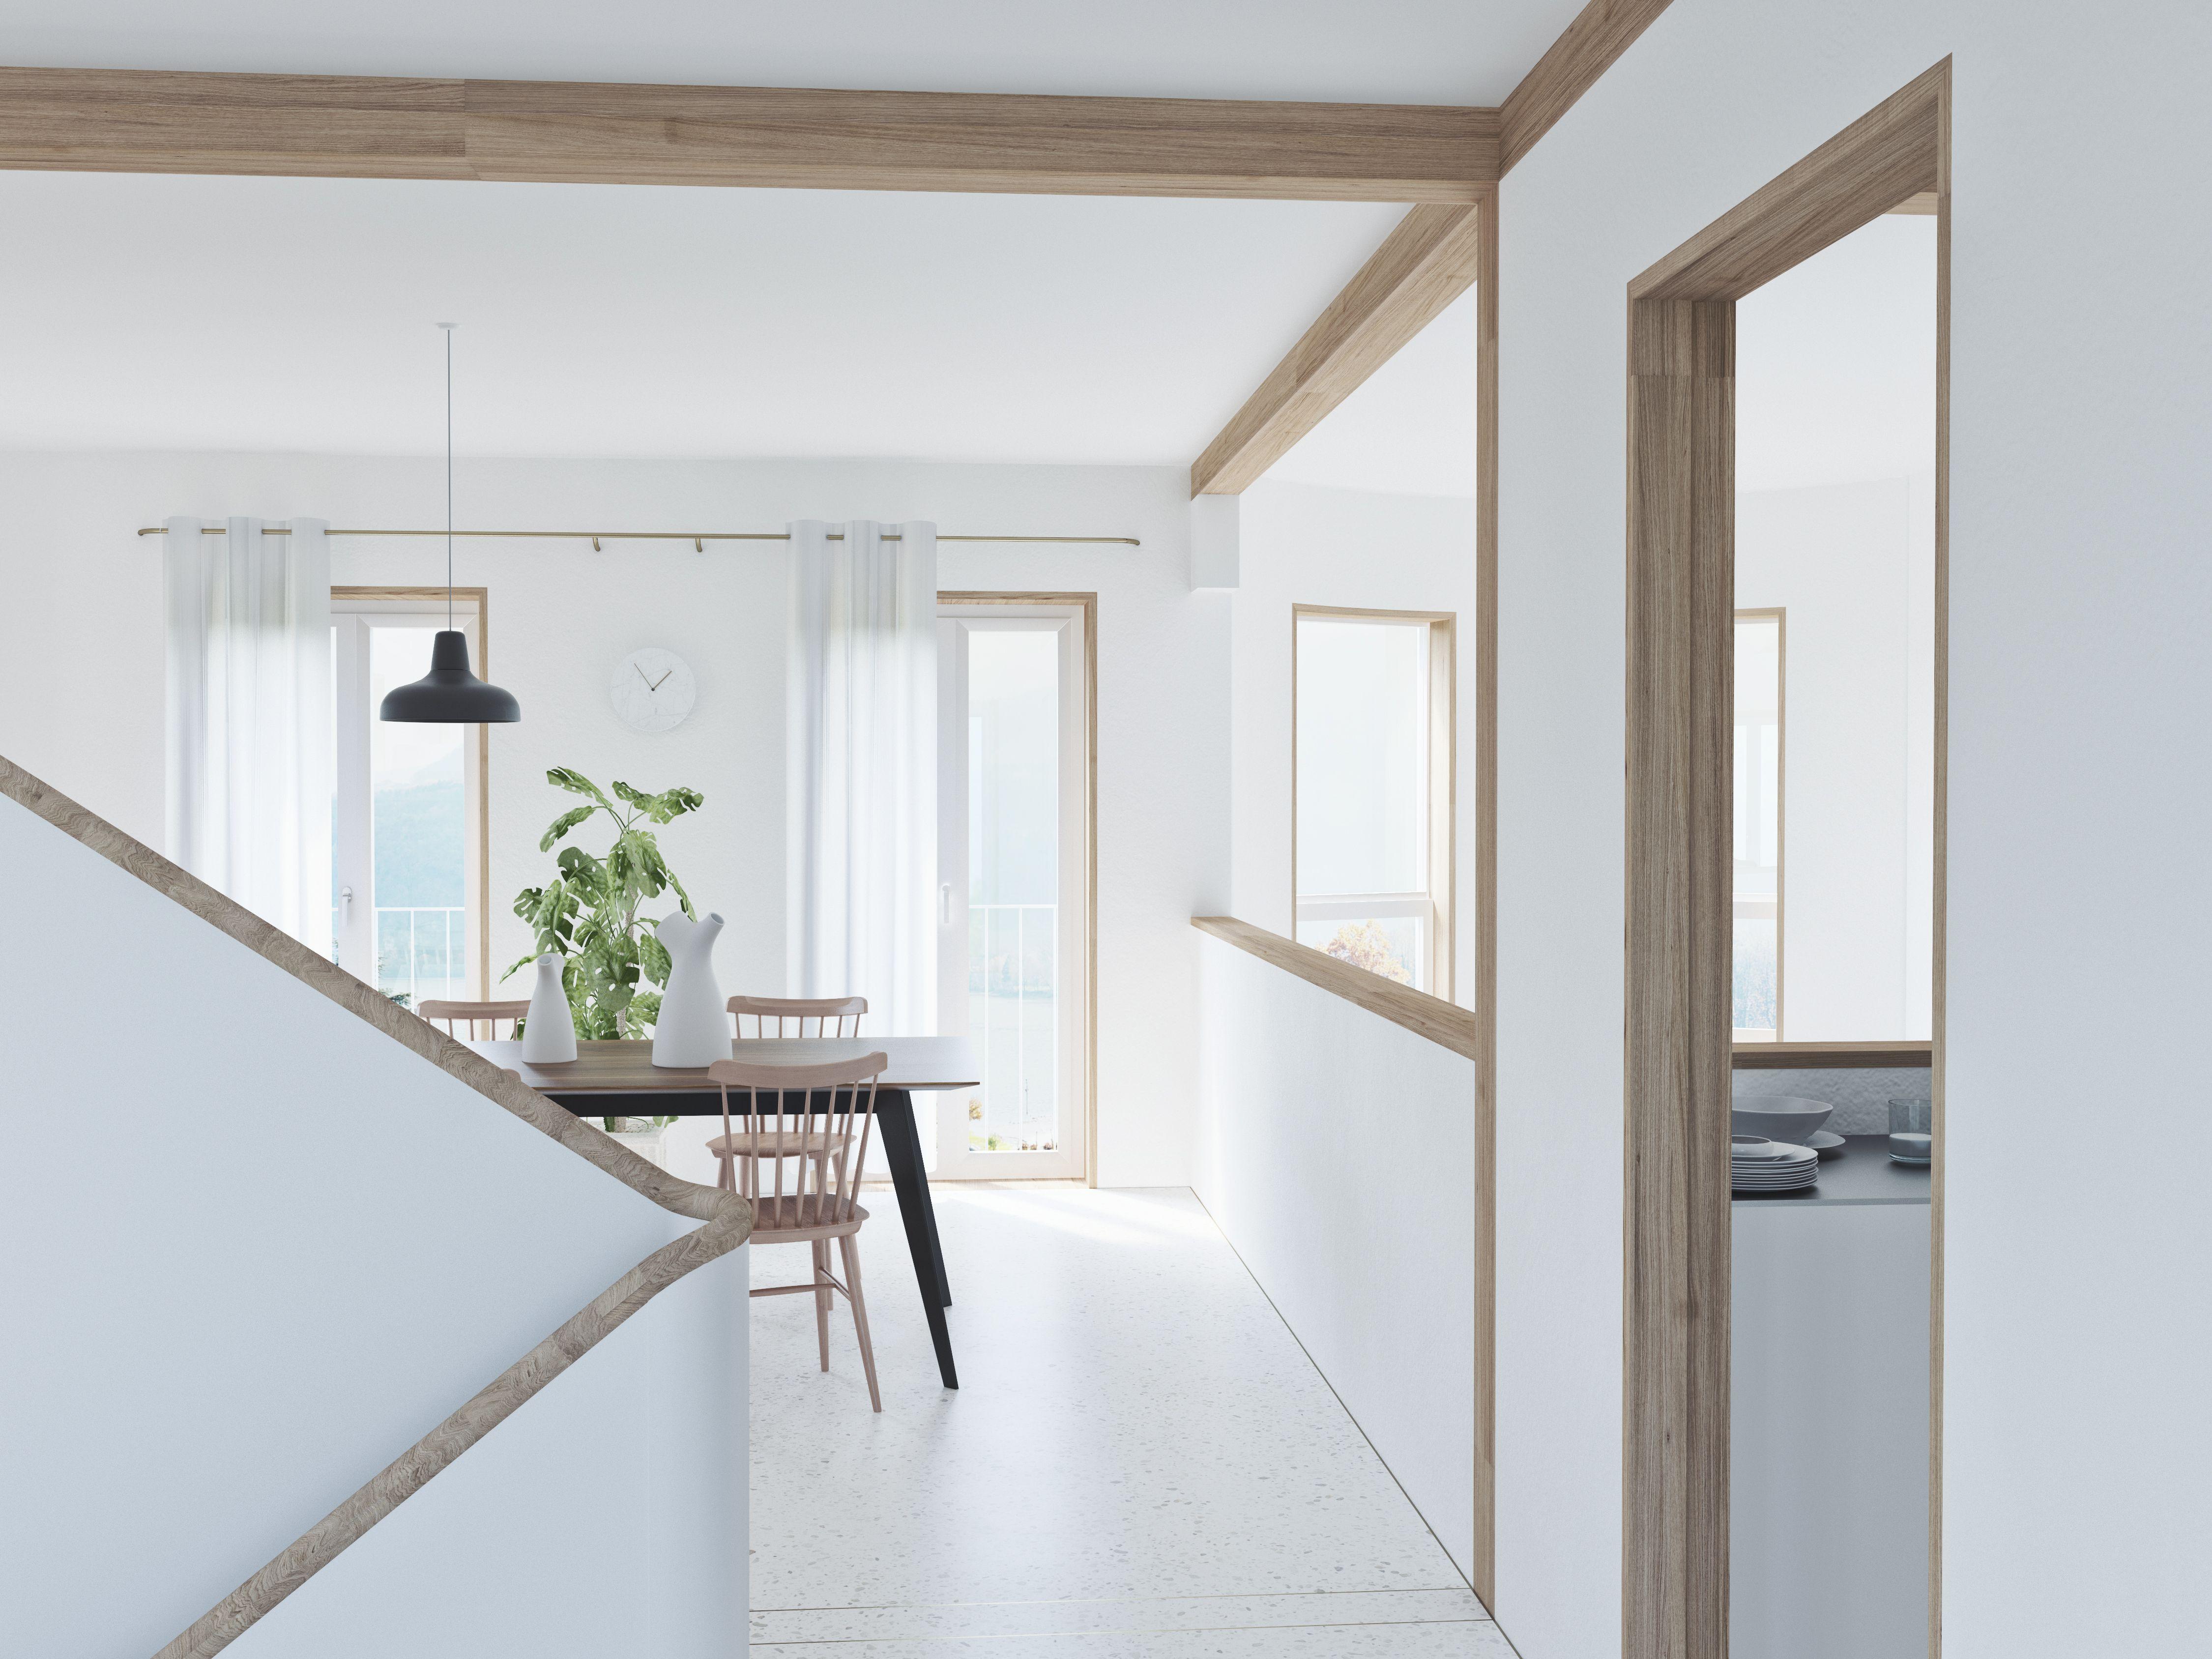 Interior Visu Entwurf Tektonik | Interior Design | Pinterest